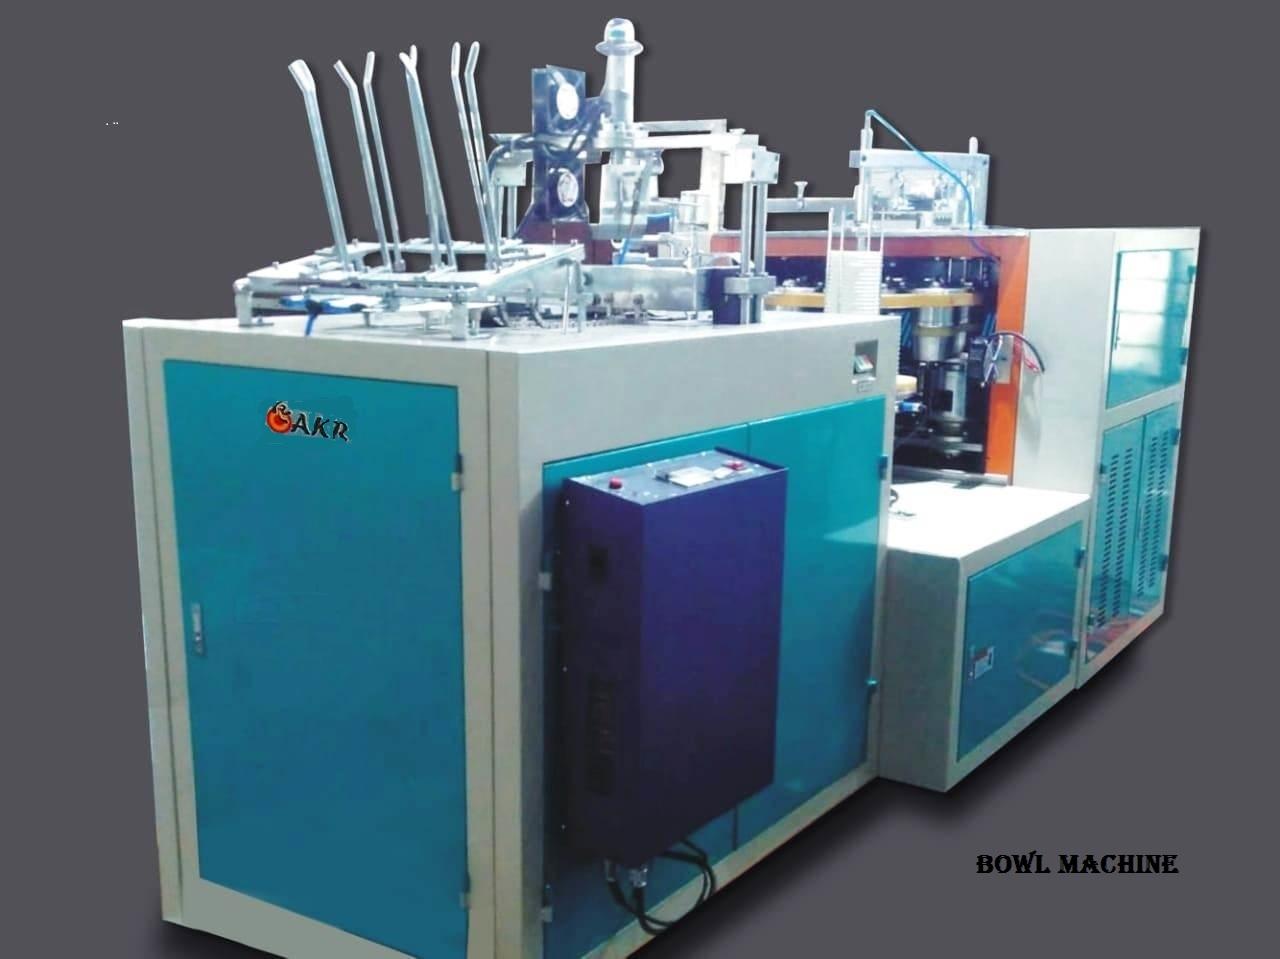 Paper Bowl Manufacturing Machine